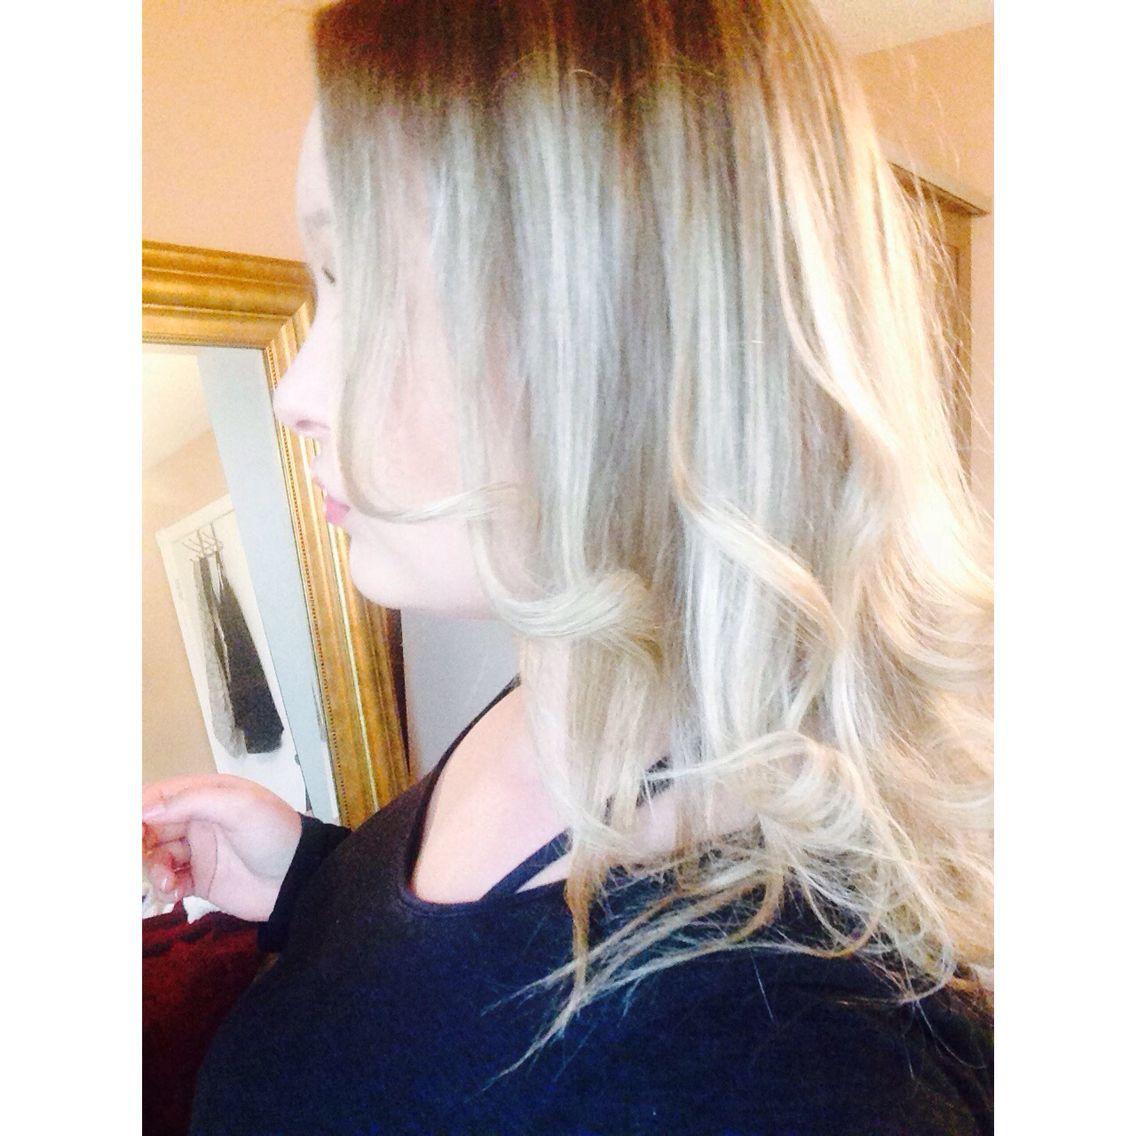 Medium Length Curly Blonde Hair !!